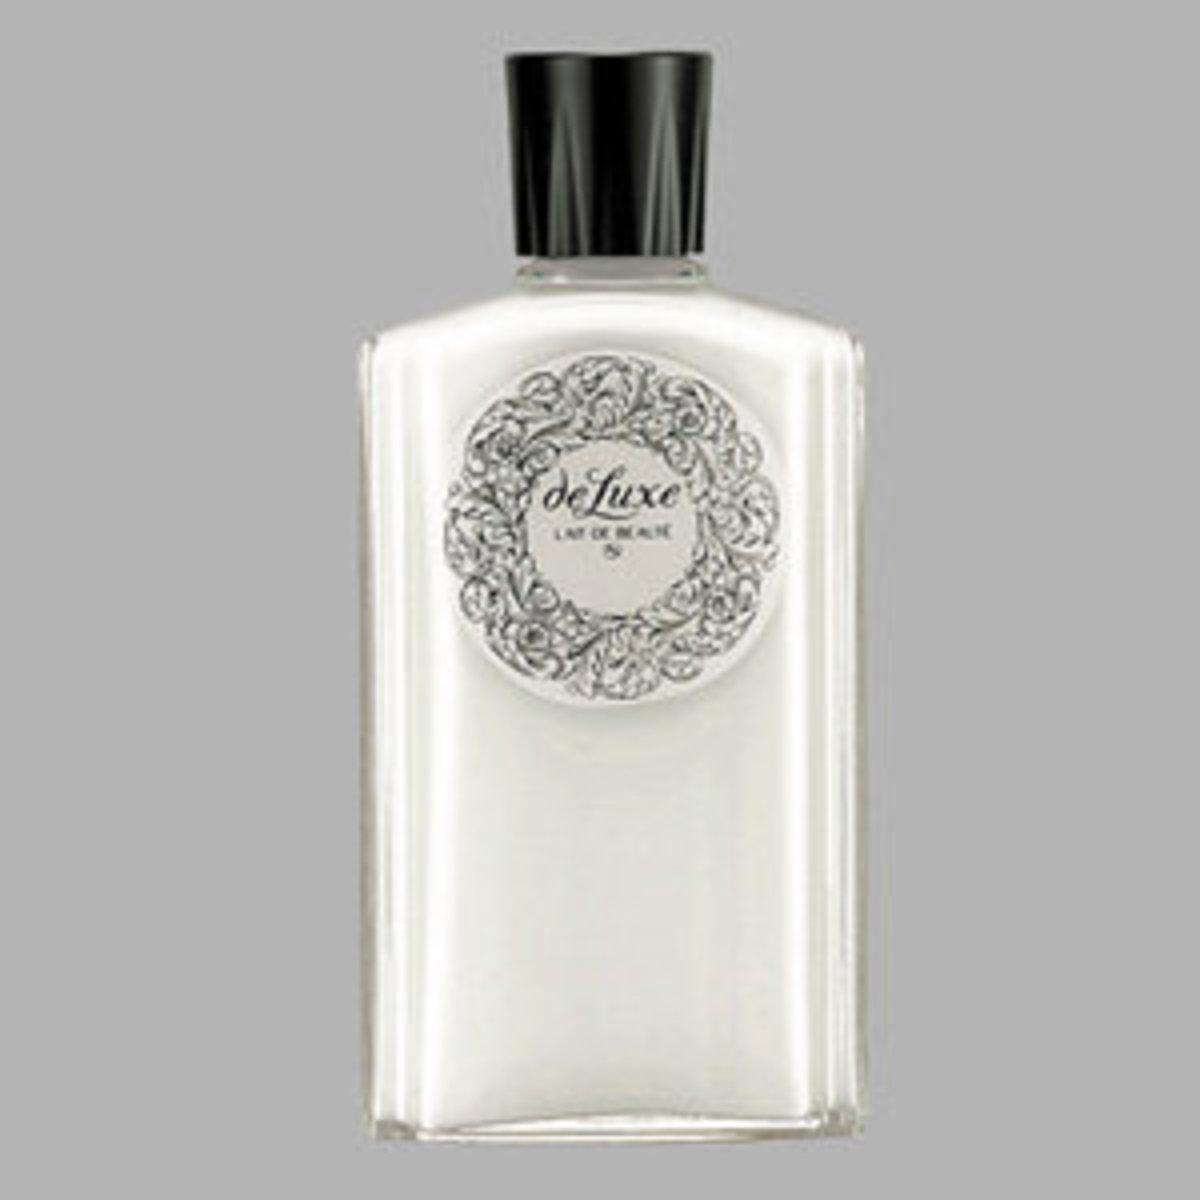 deluxe乳液(乾性皮膚用)150ml